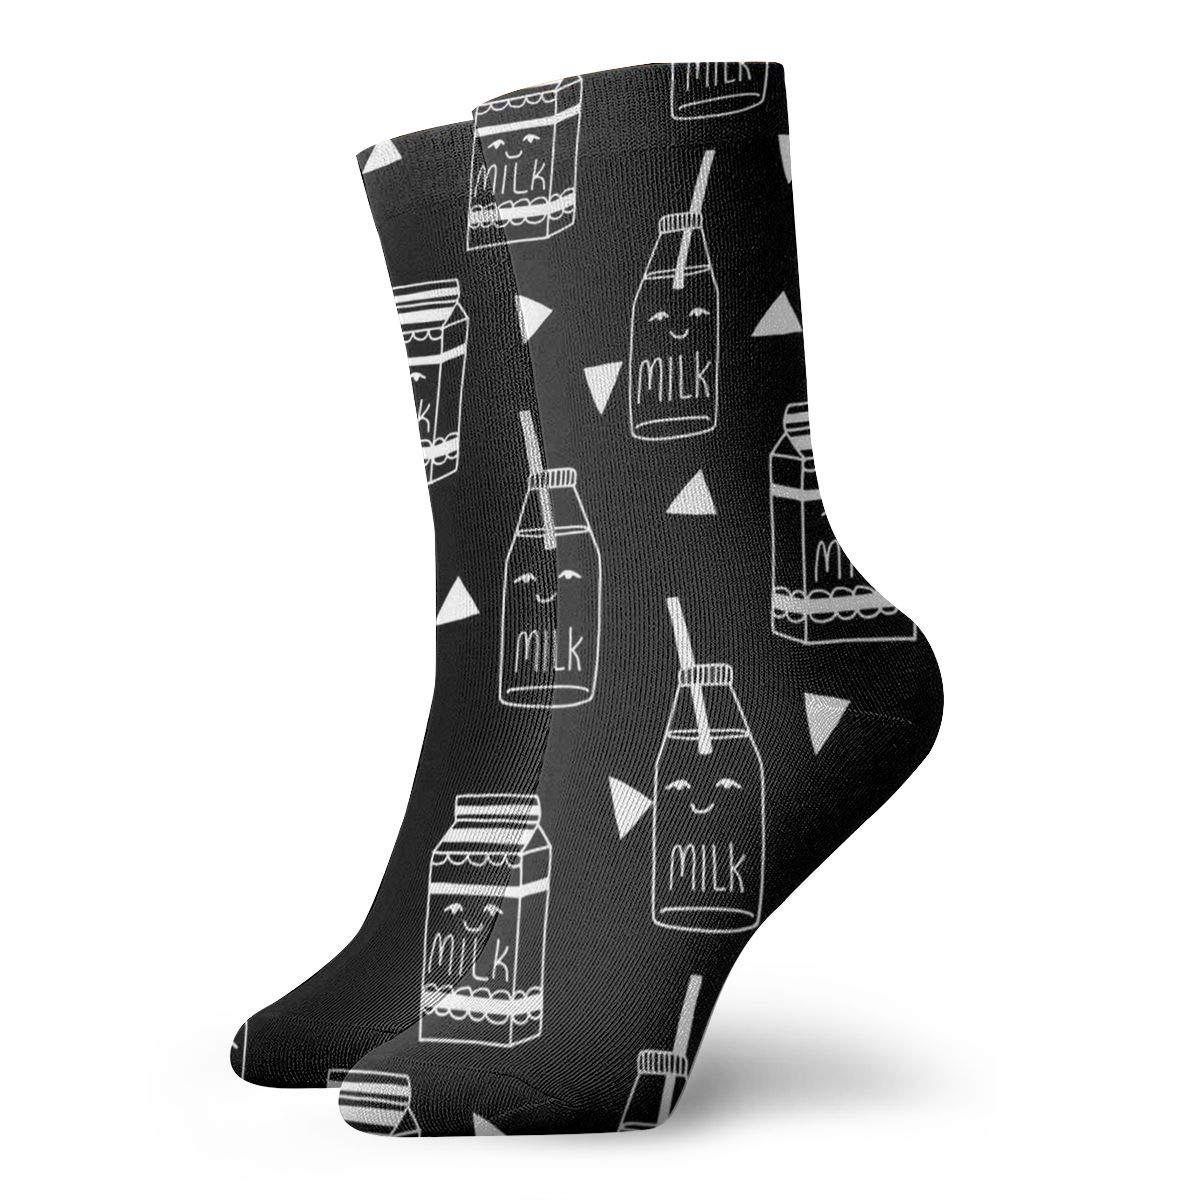 Milk Unisex Funny Casual Crew Socks Athletic Socks For Boys Girls Kids Teenagers